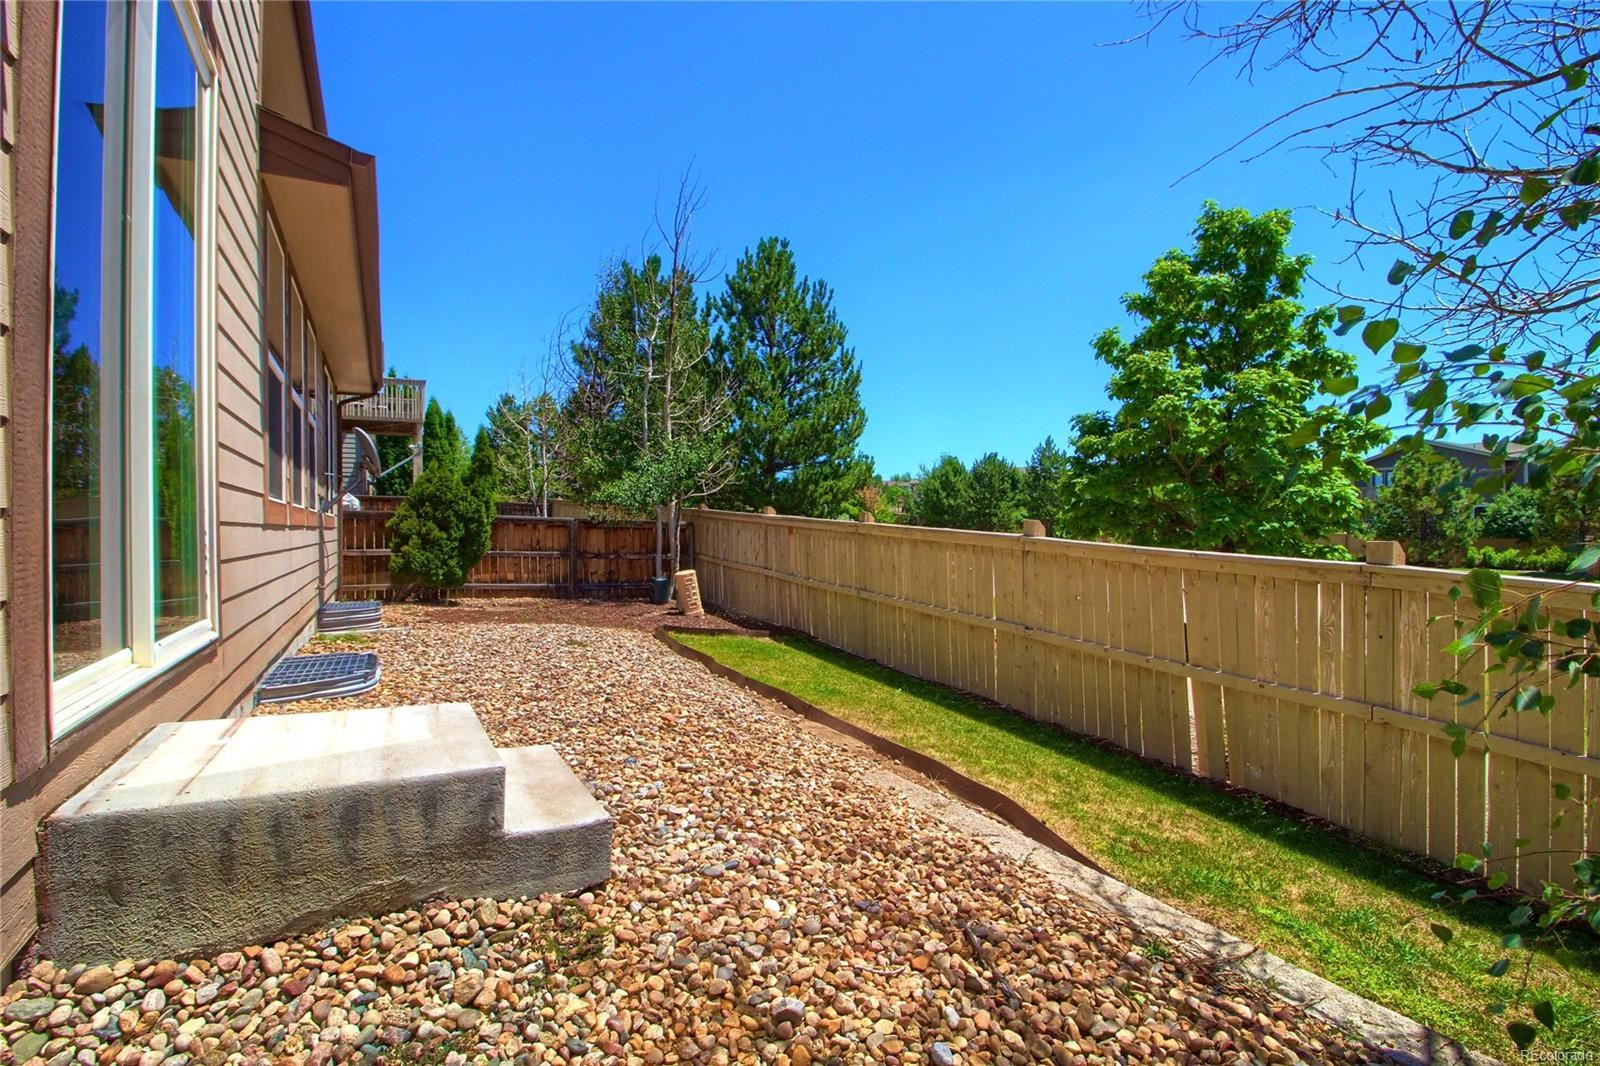 MLS# 3018887 - 38 - 10677 Cedarcrest Circle, Highlands Ranch, CO 80130